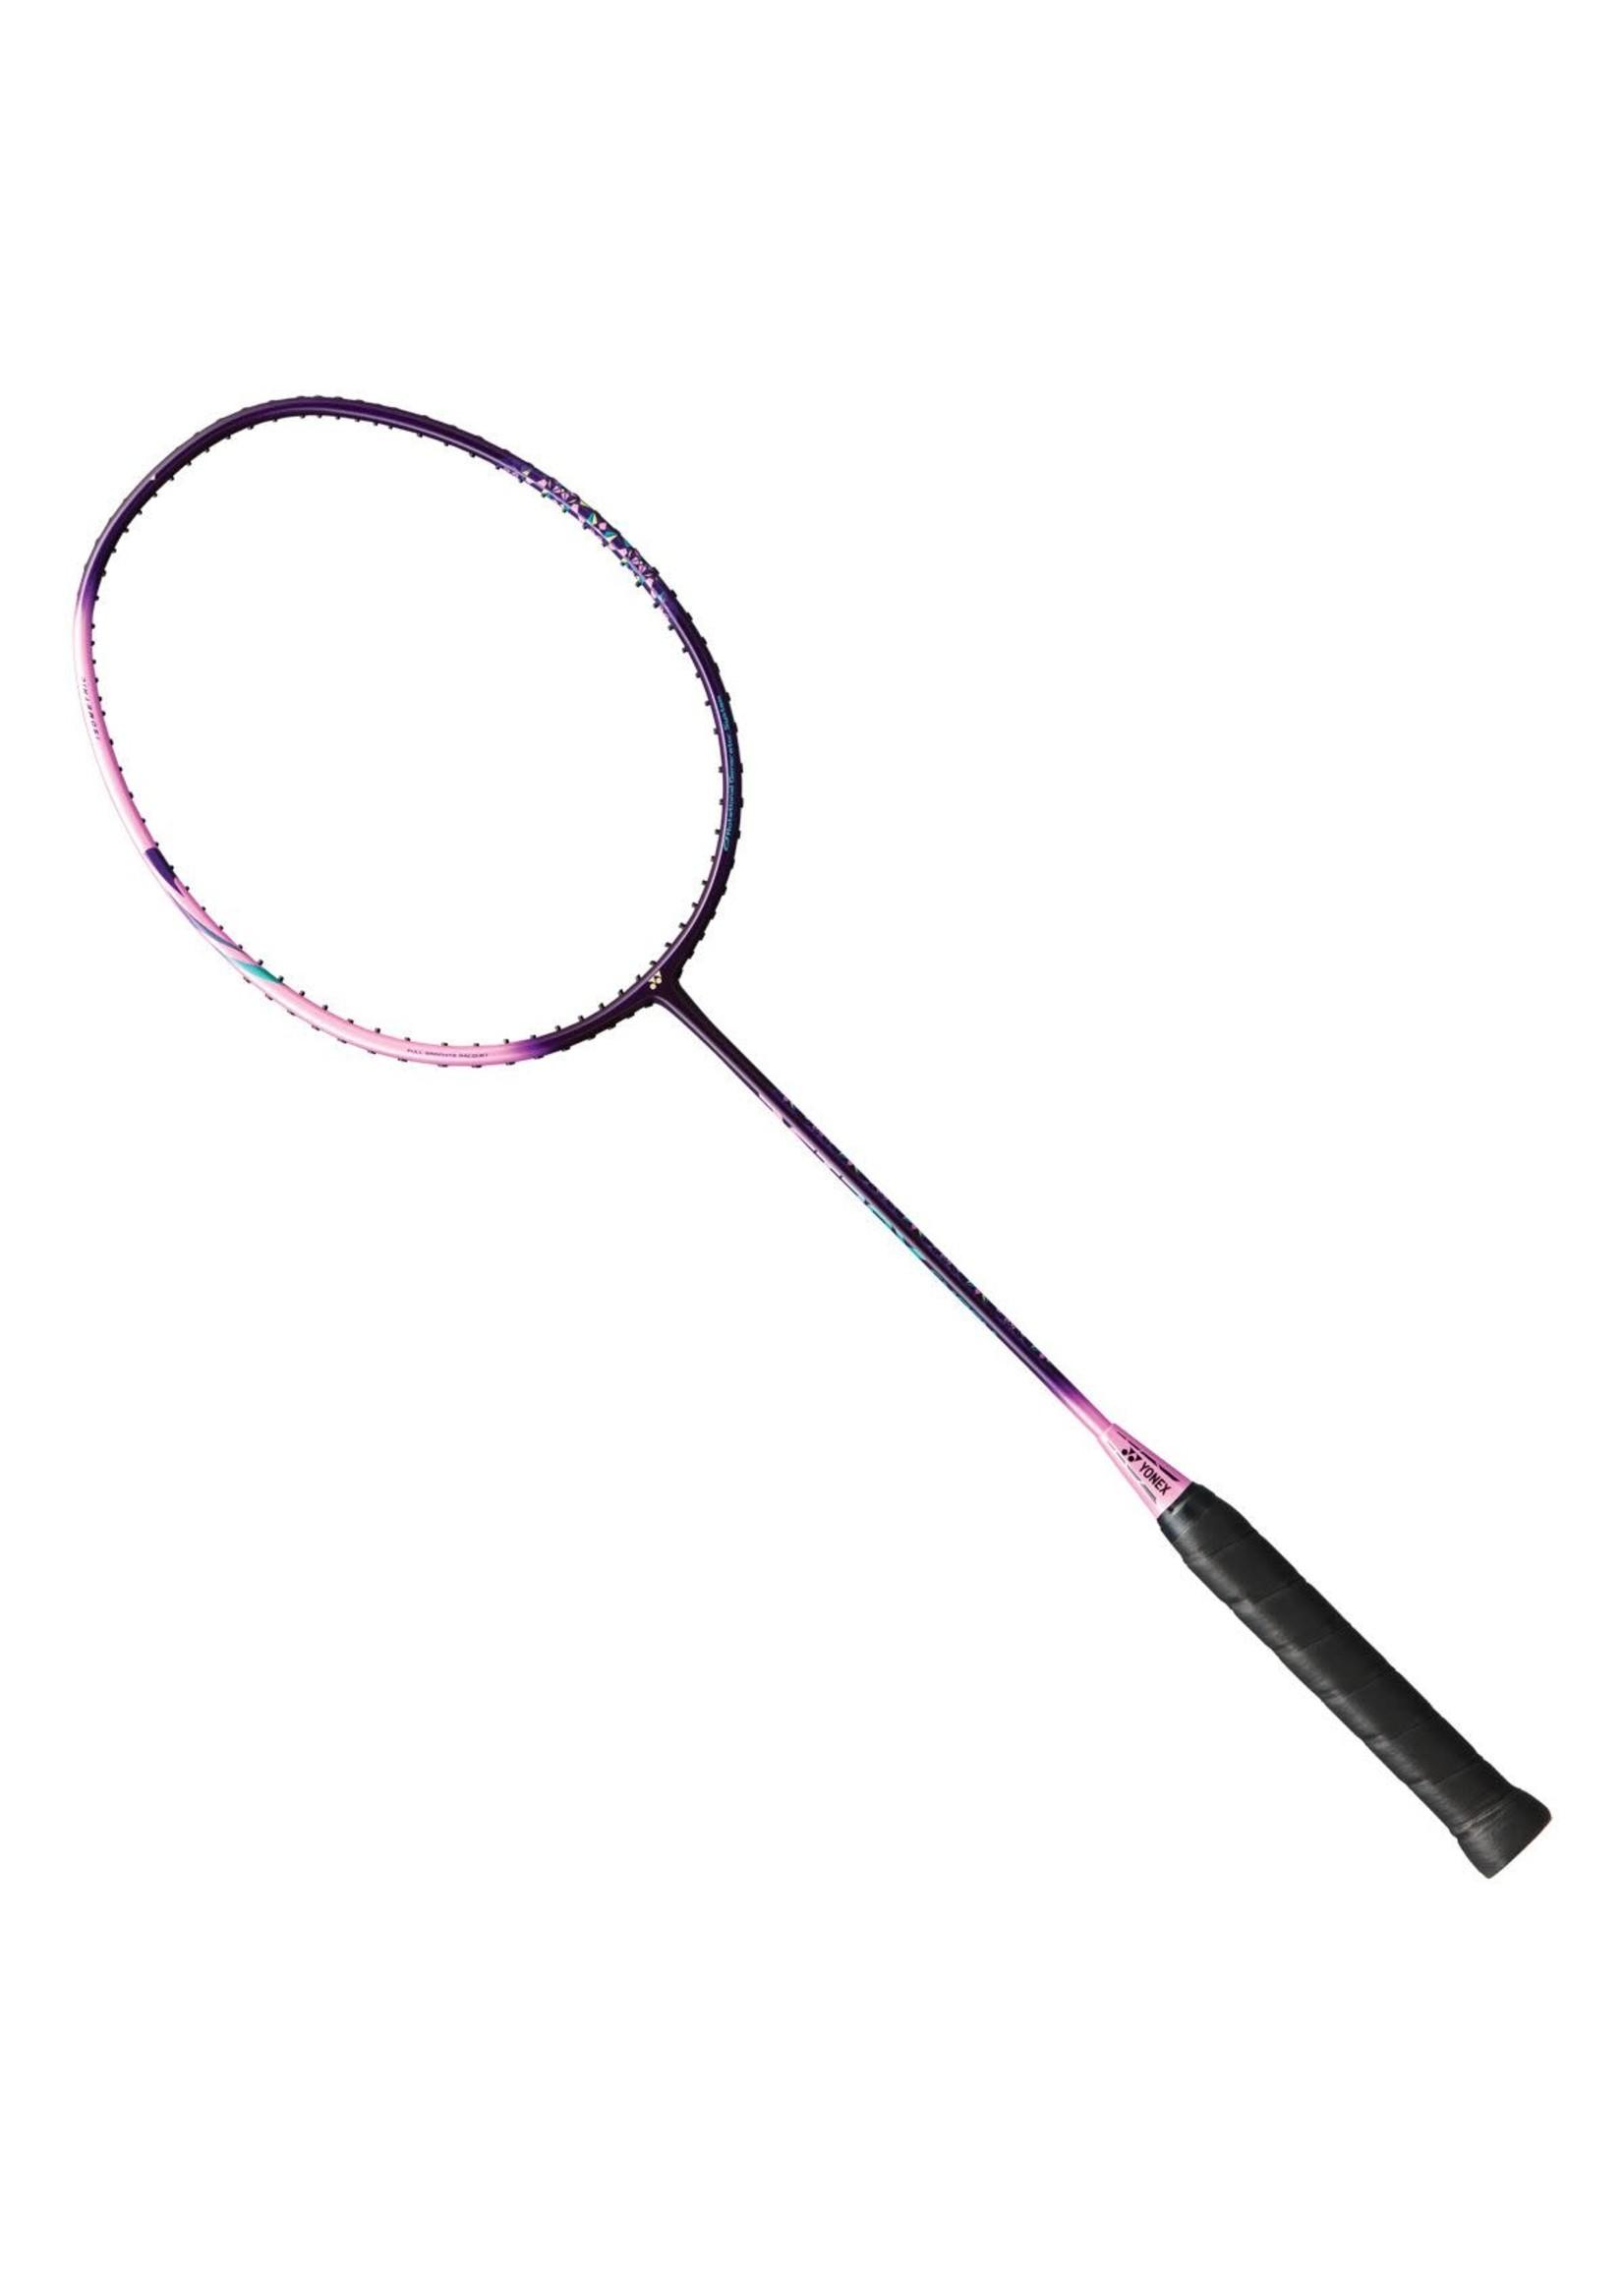 Yonex Yonex Astrox Smash Badminton Racket - Purple/Pink [2021]